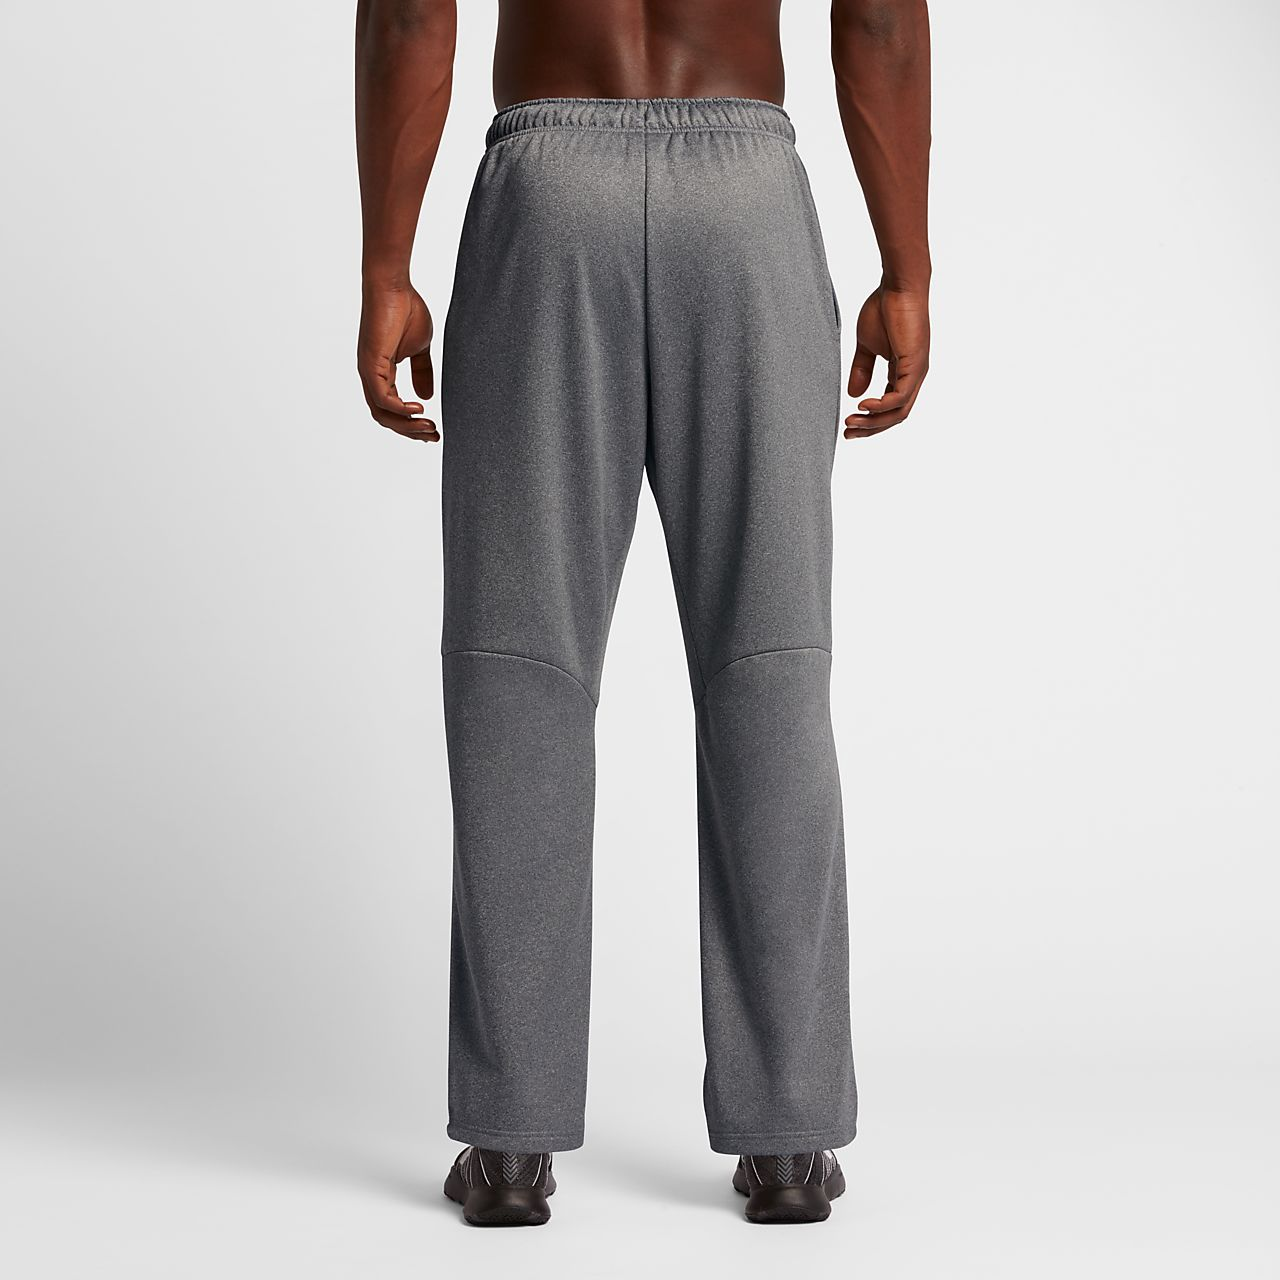 Nike Therma Men's Training Pants Carbon Heather/Black